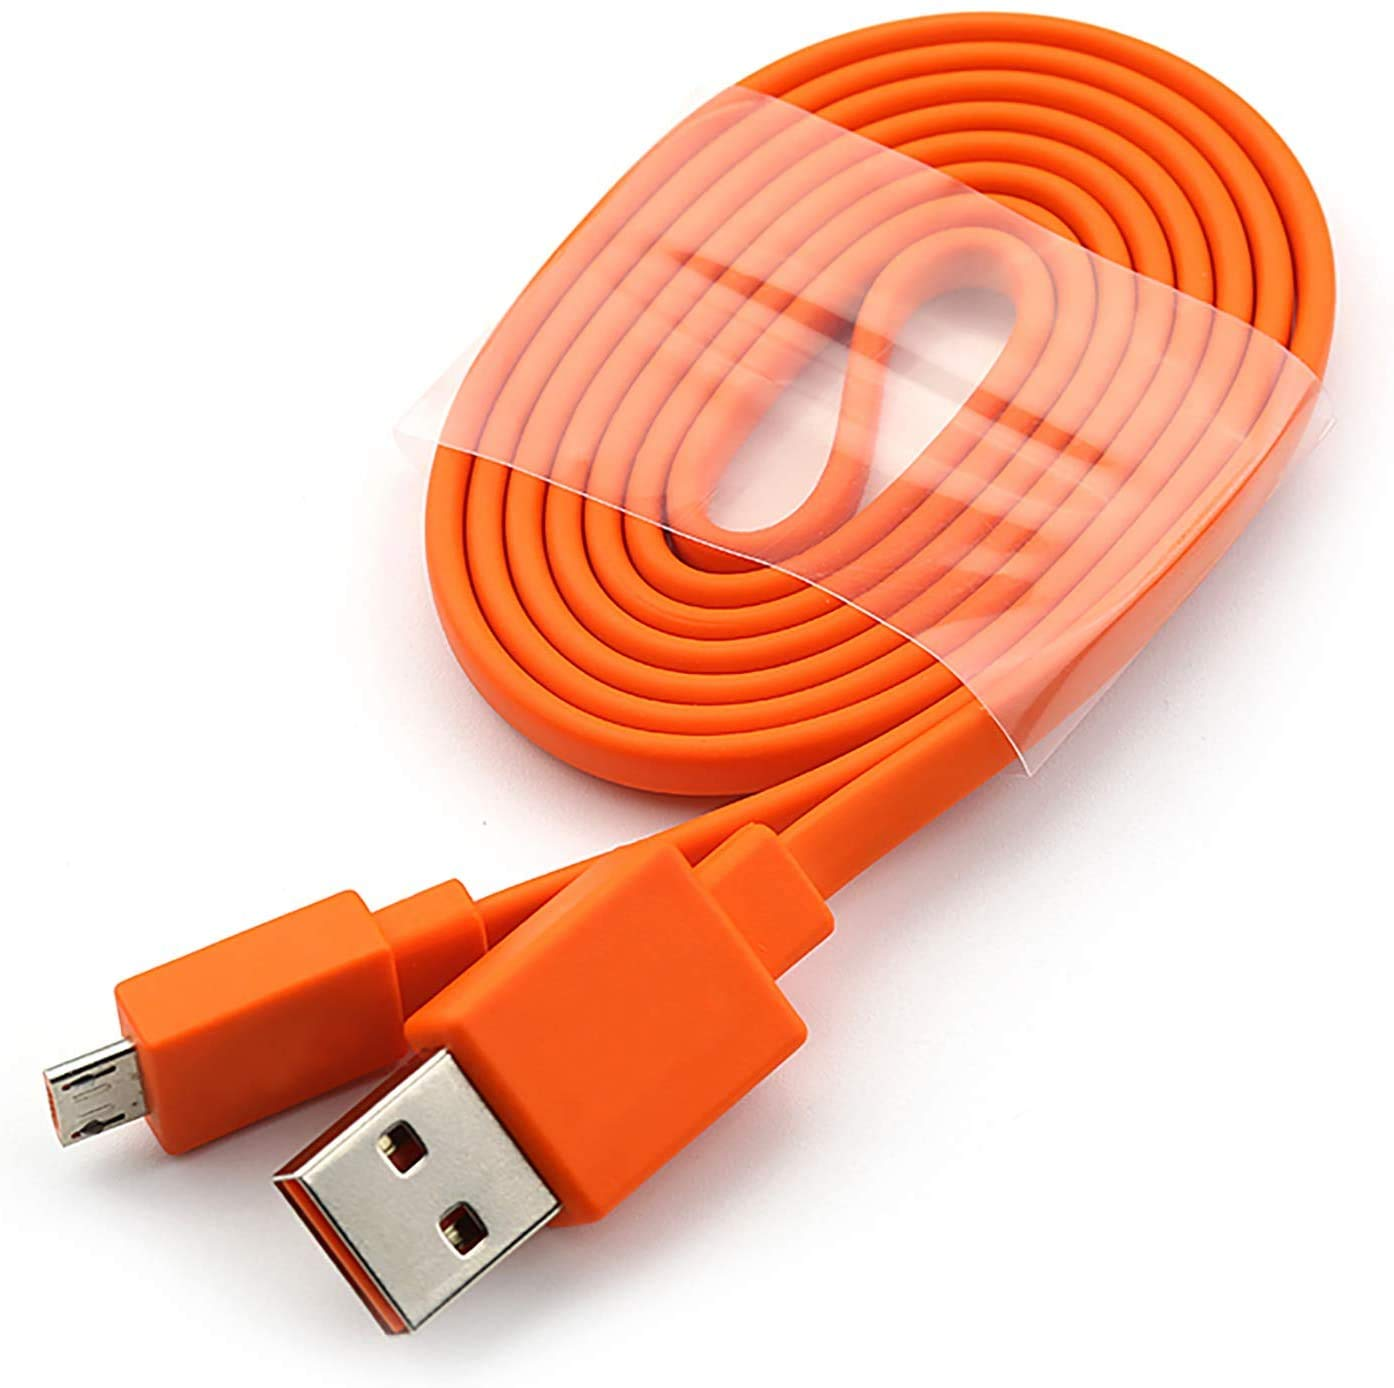 Cable de carga para JBL Charge 3 / 2 Flip 4 Flip 2 Flip 3